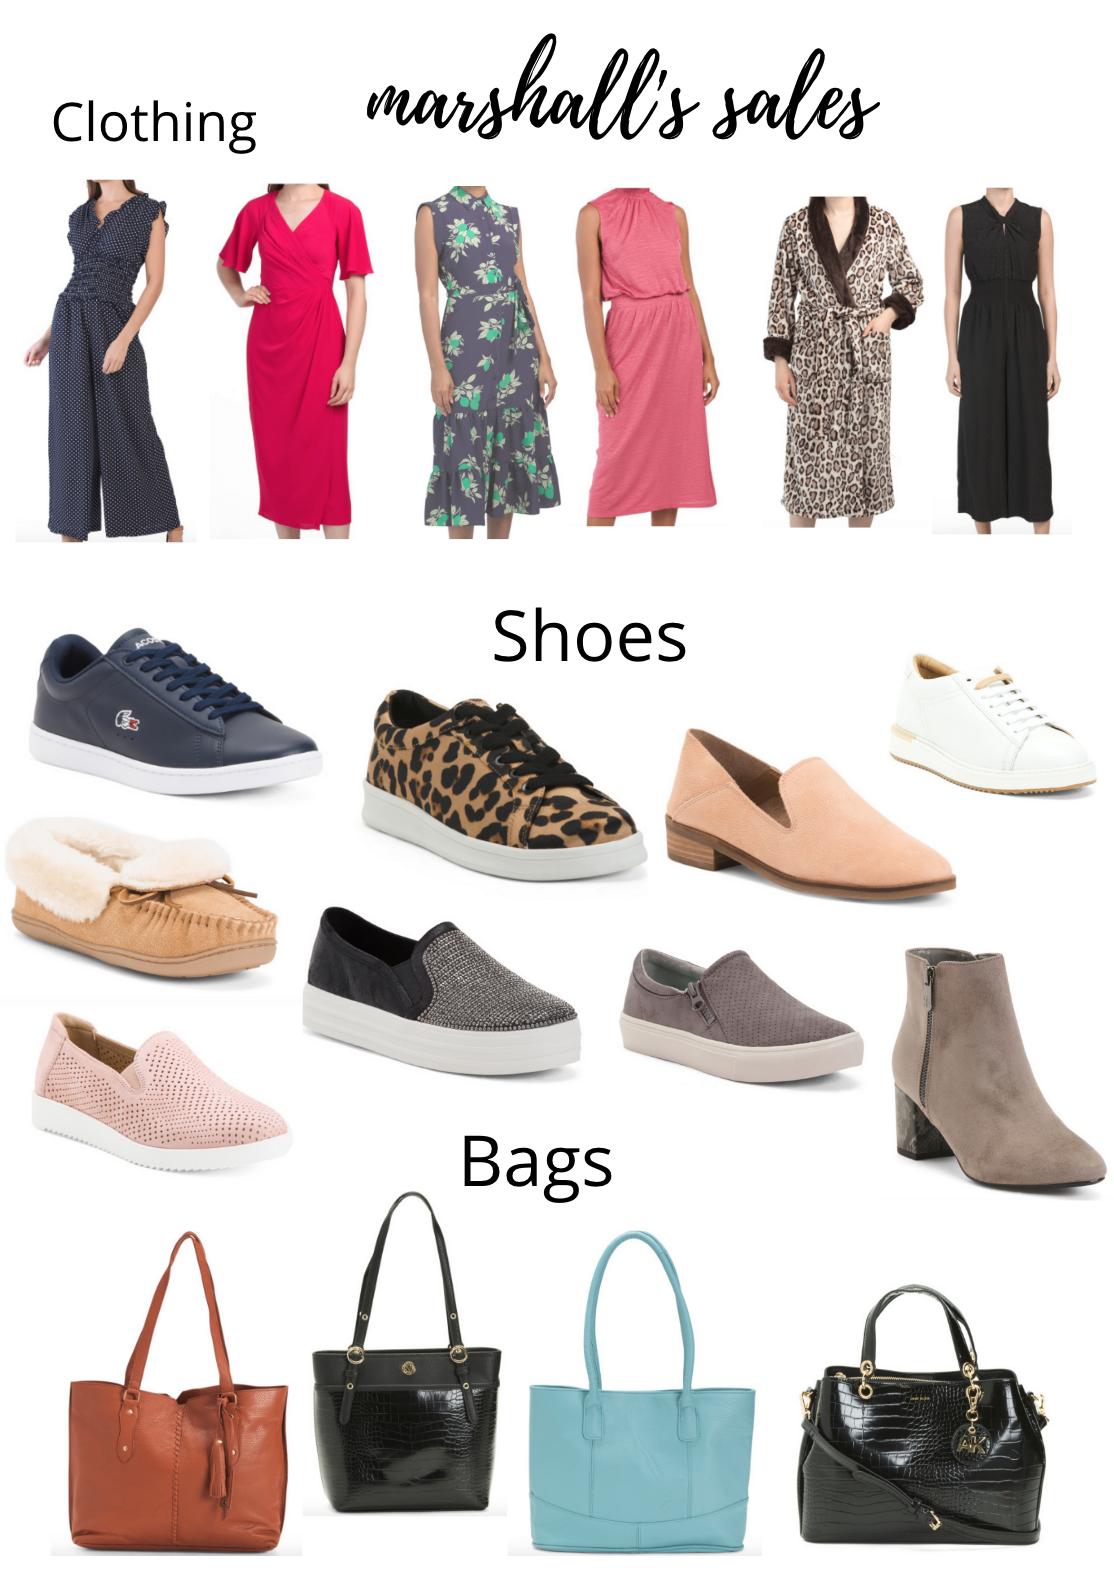 Fashion over 50: Marshall's Fashion